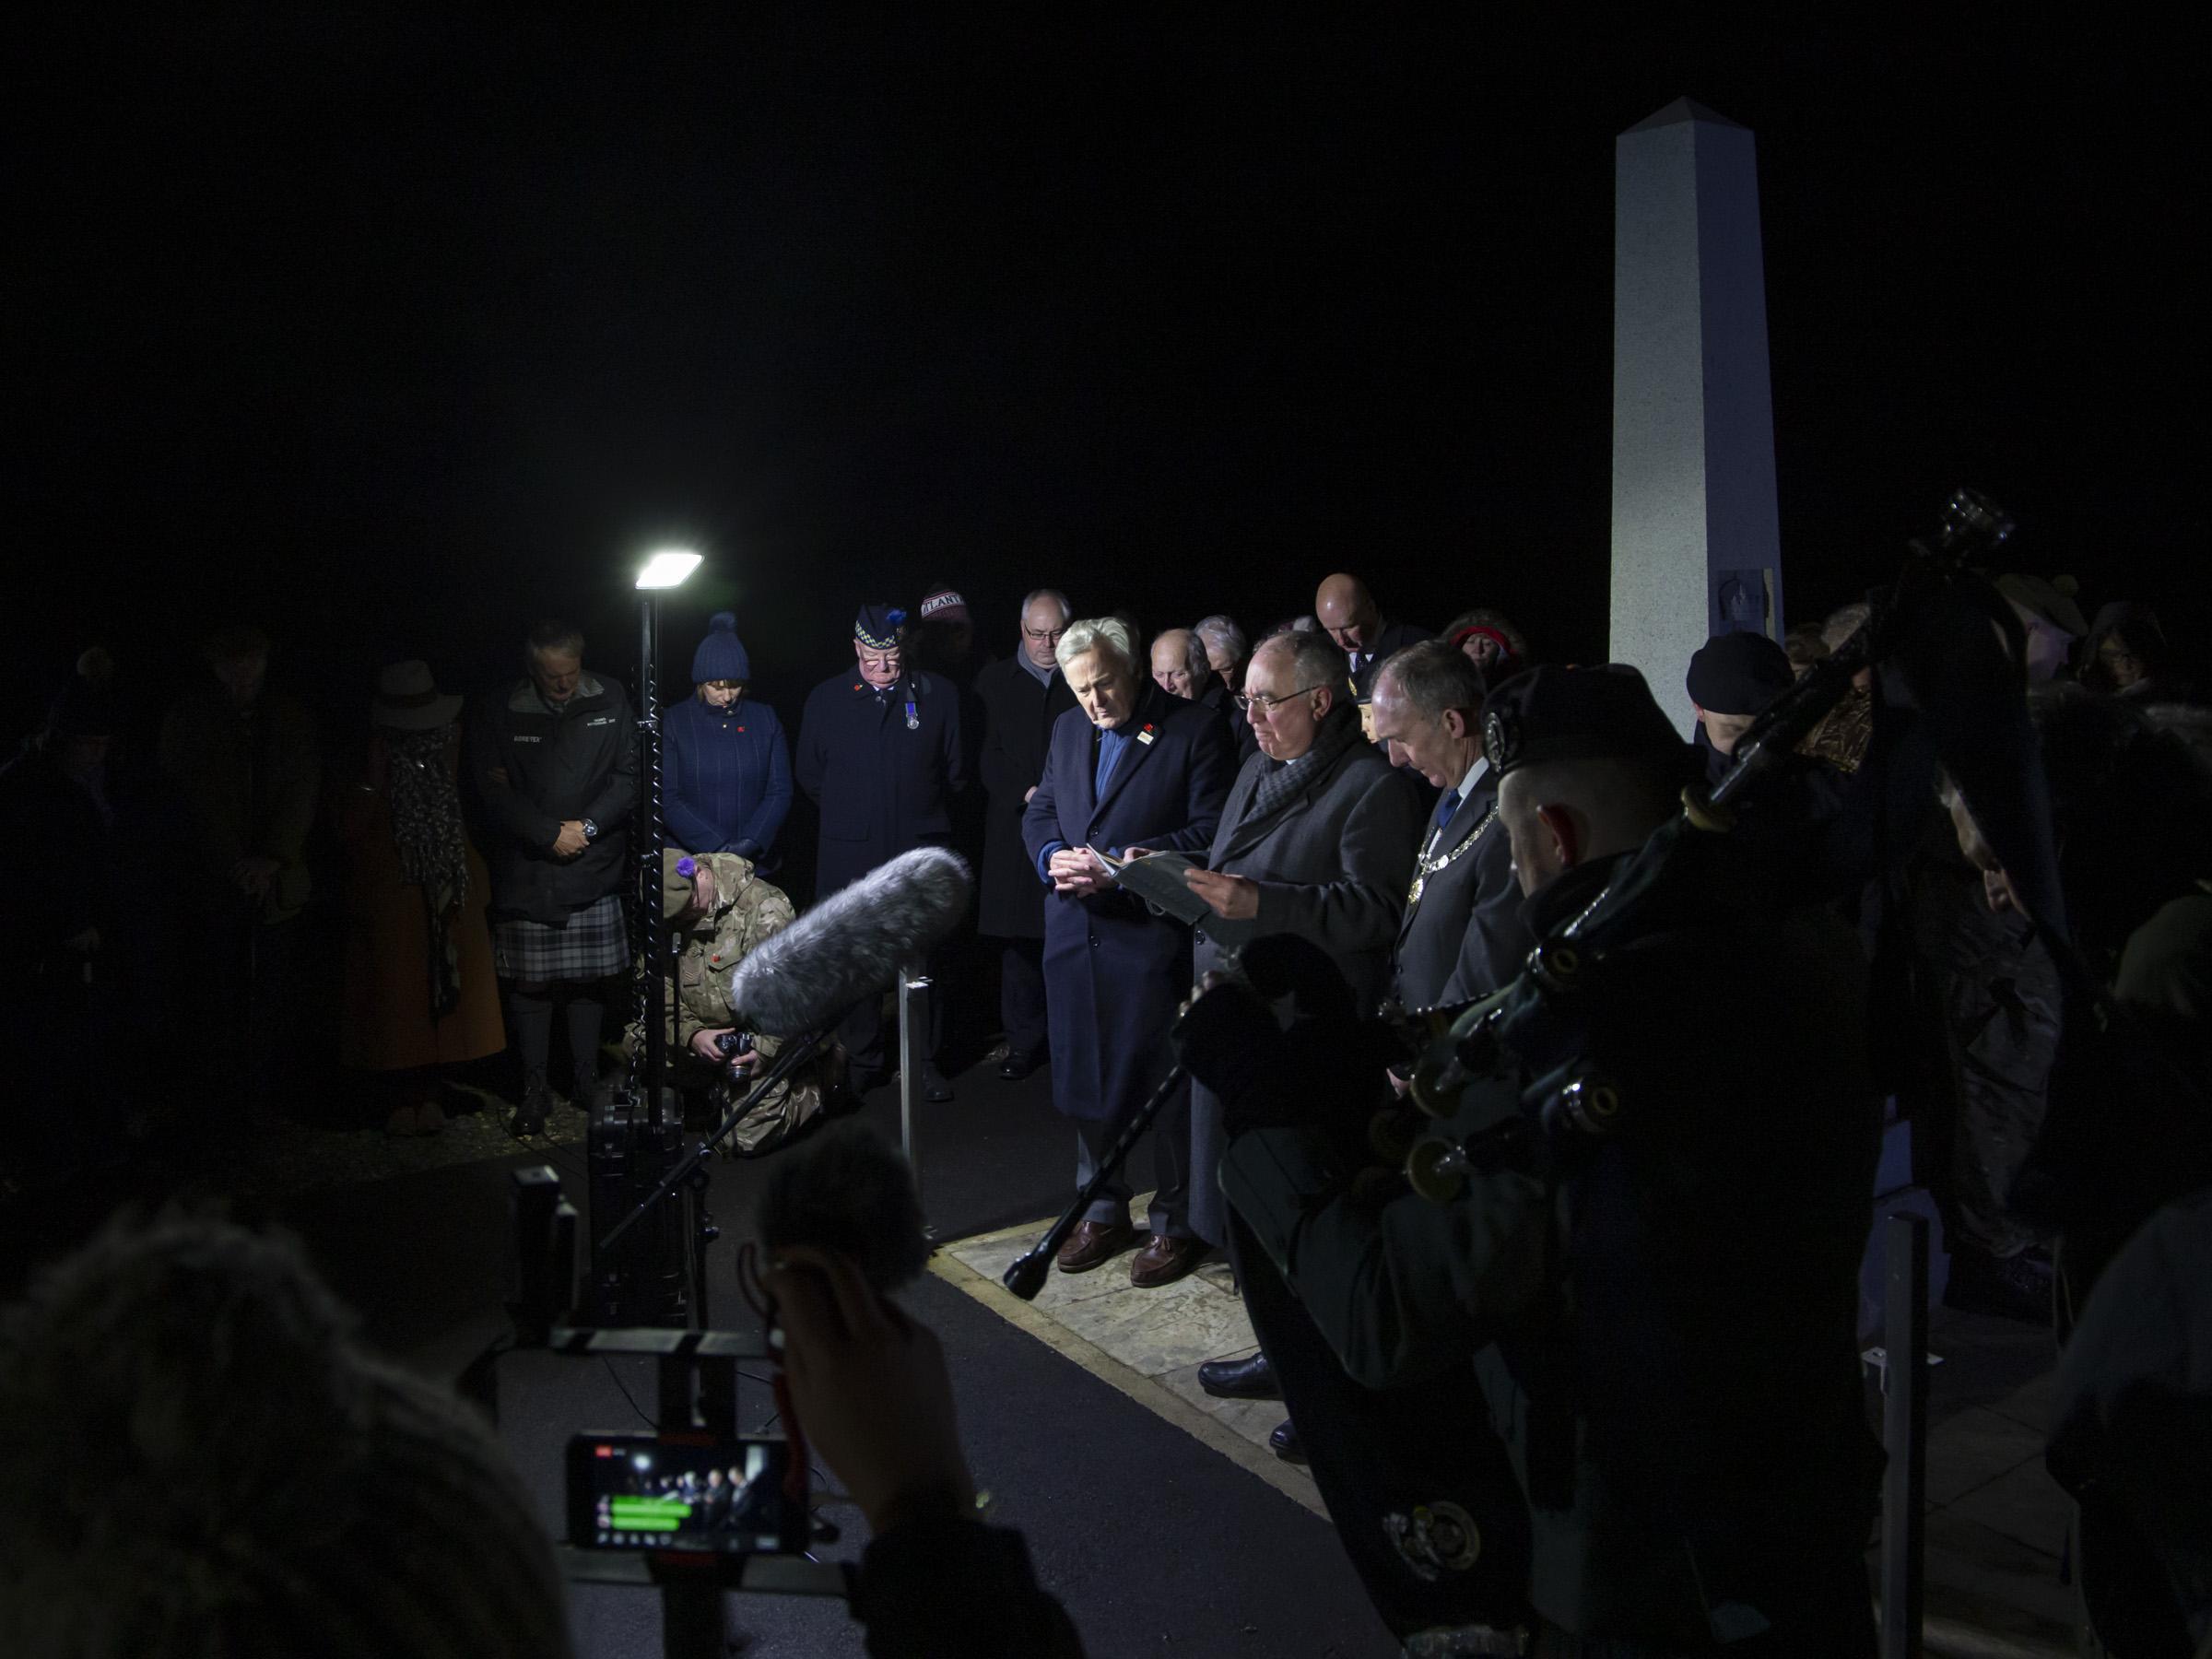 Iolaire Event NYE 2018_19 Vigil 192